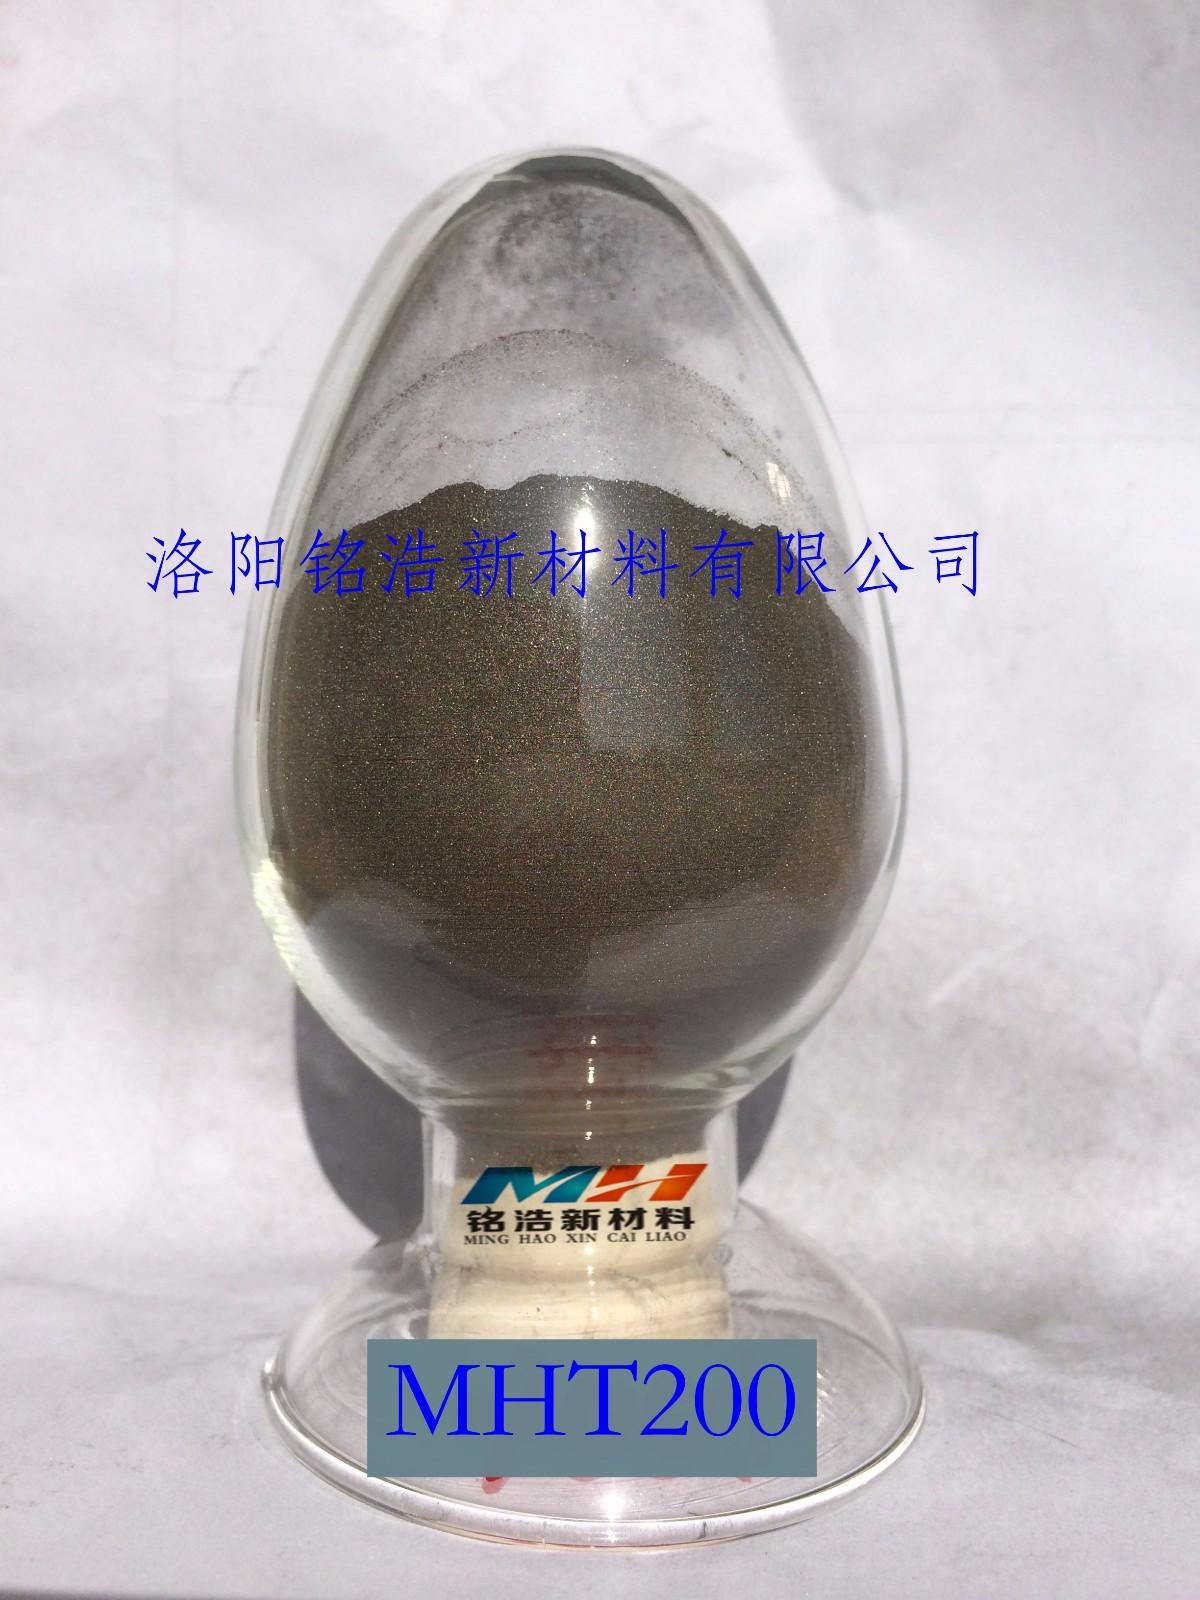 MHT200.jpg